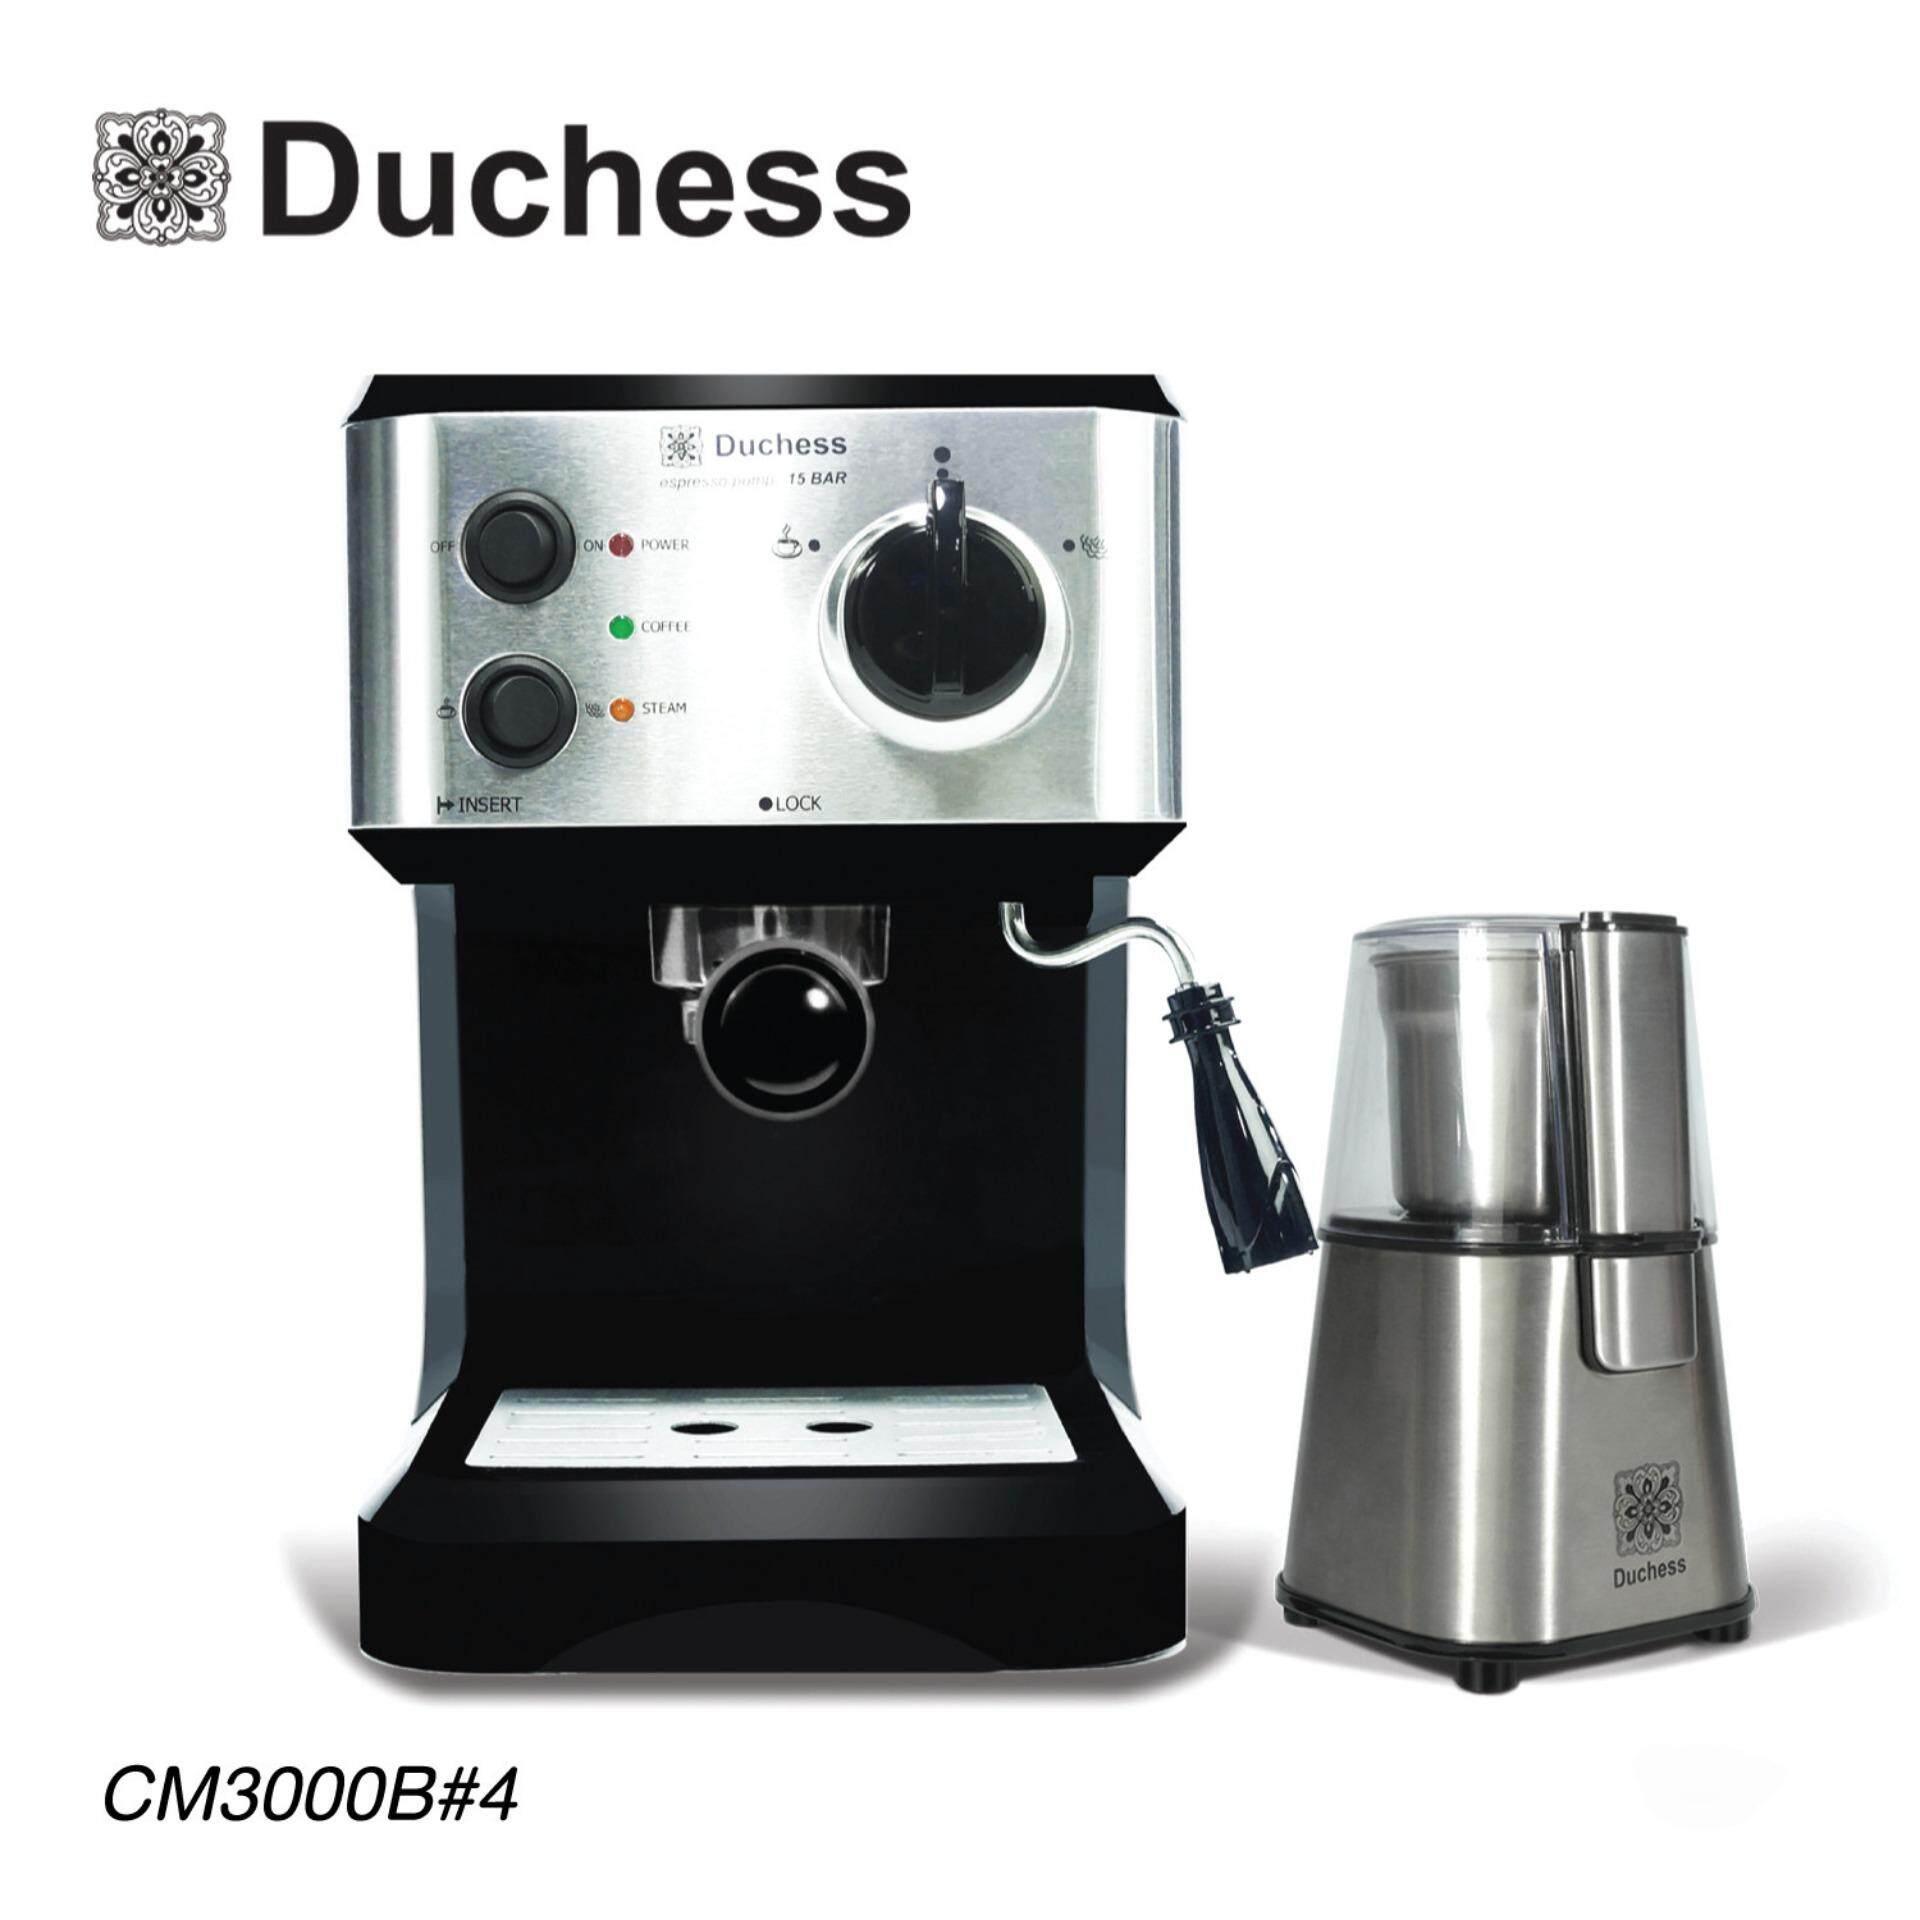 Duchess CM3000B#4 - เครื่องชงกาแฟ CM3000B + เครื่องบดเมล็ดกาแฟ CG9100S  - 373fd5b6d9d5ba41e1ab294f788a1cc8 - แนะนำเครื่องชงกาแฟชุดเล็ก สำหรับเริ่มต้น